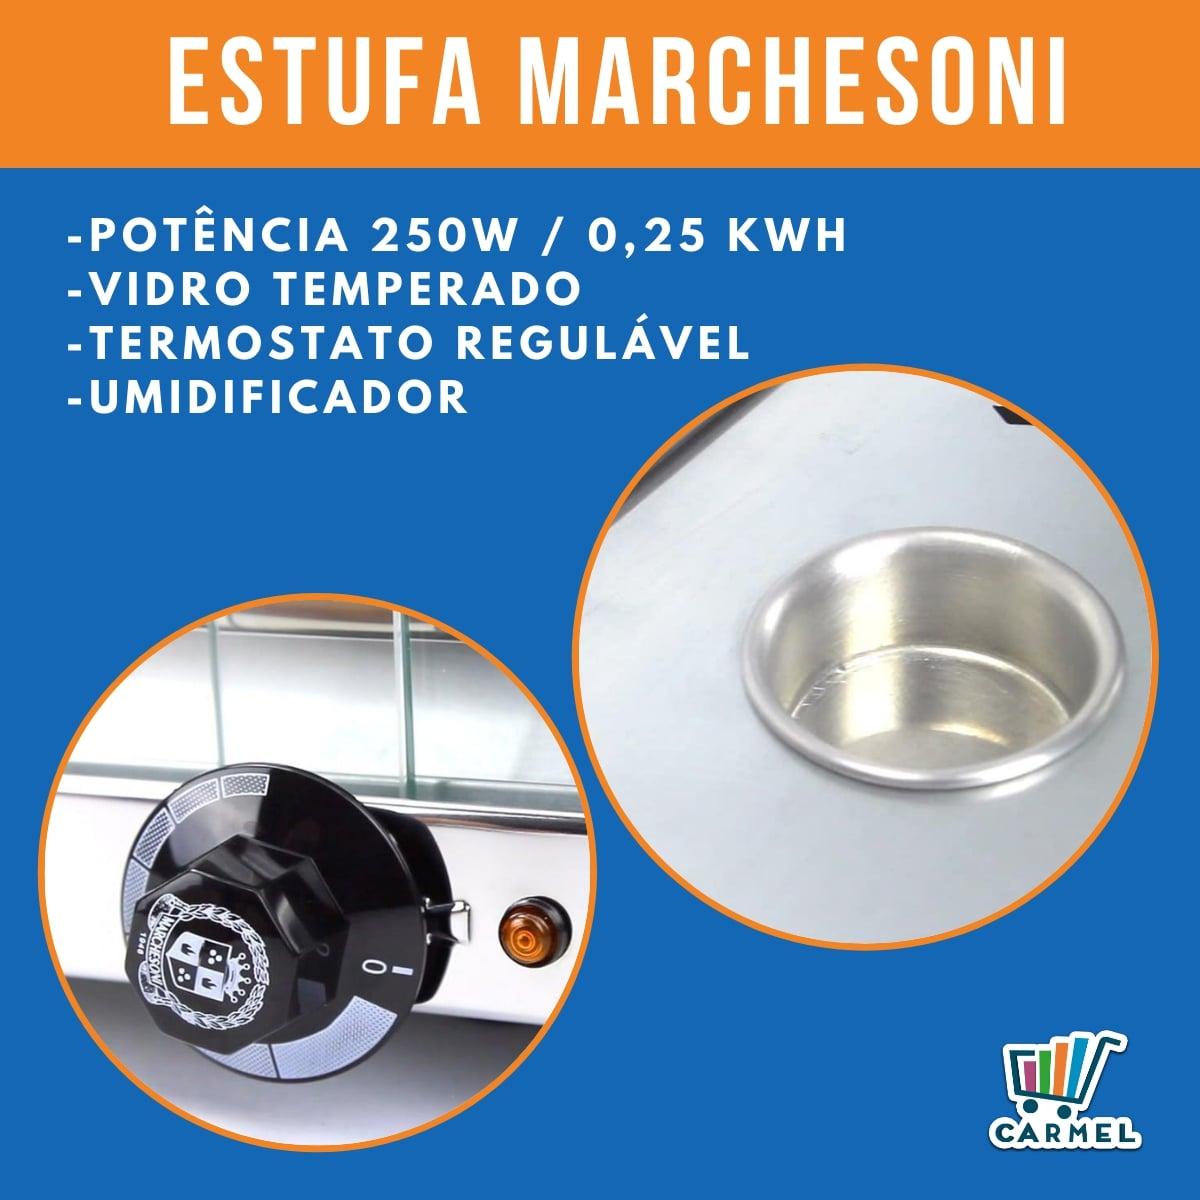 Estufa Para Salgados Dupla Marchesoni 12 Bandejas Linha Ouro - Ef2221/222  - Carmel Equipamentos